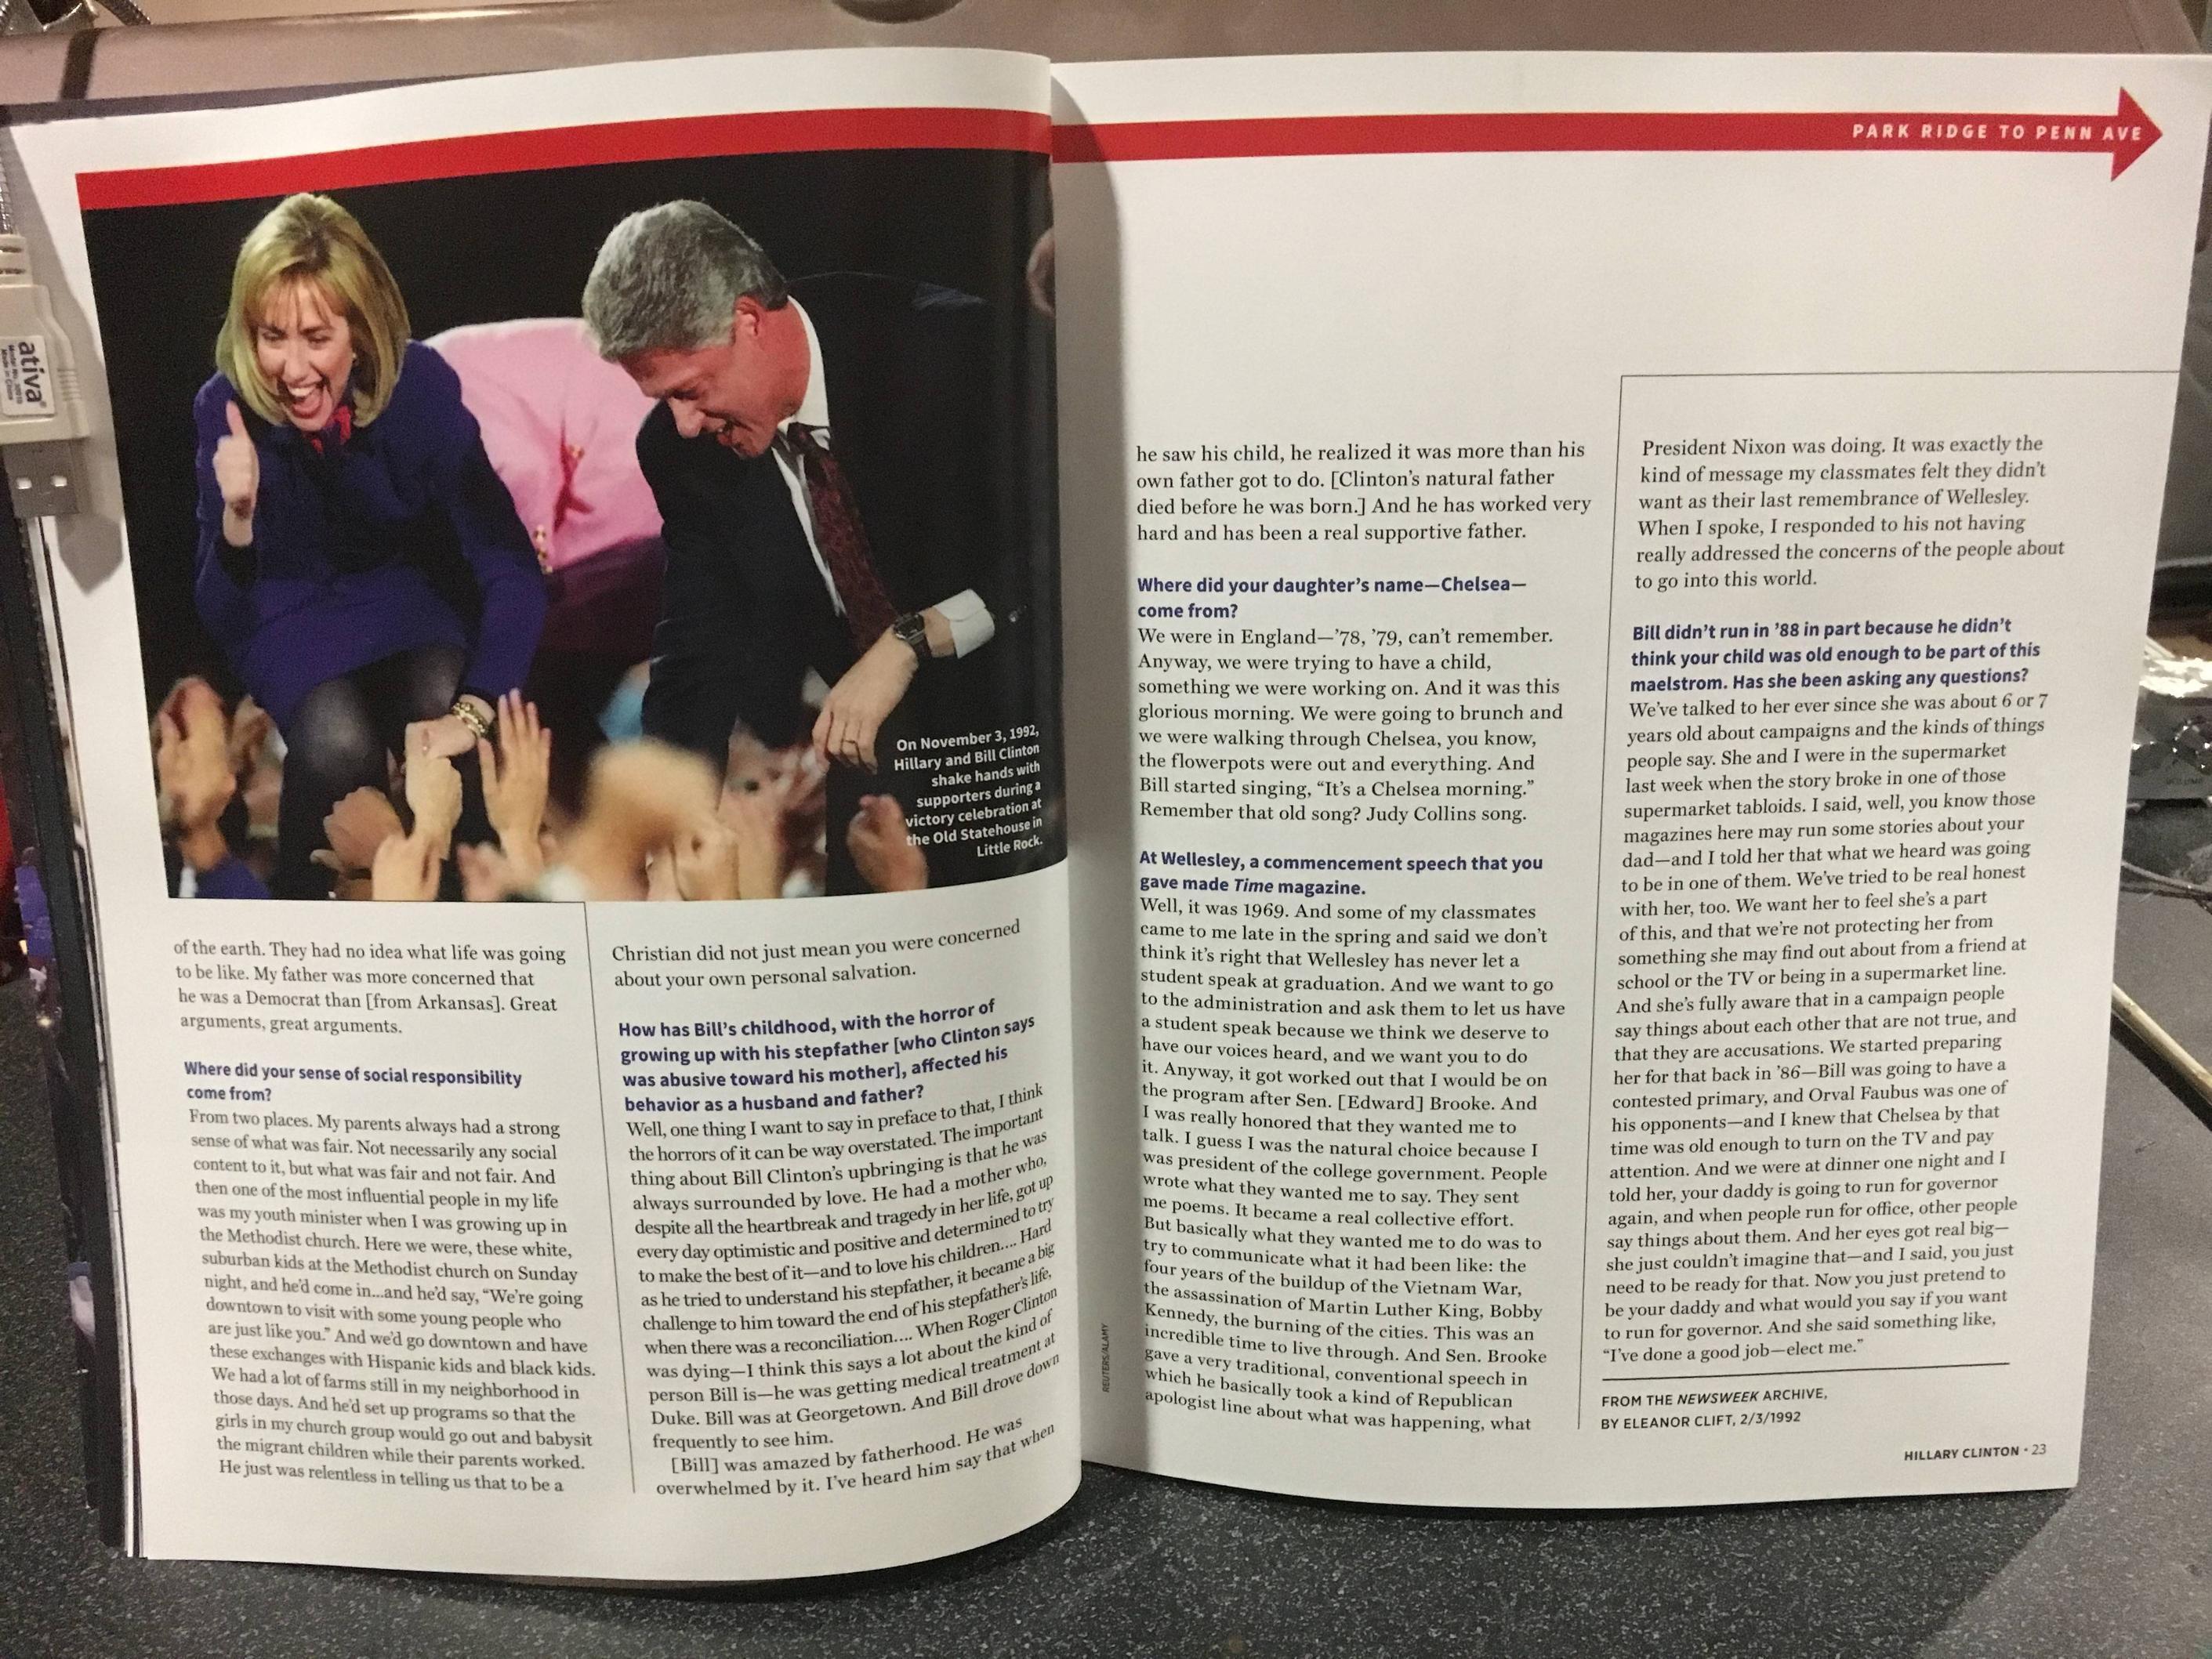 newsweek-madame-hillary-clinton-page-12